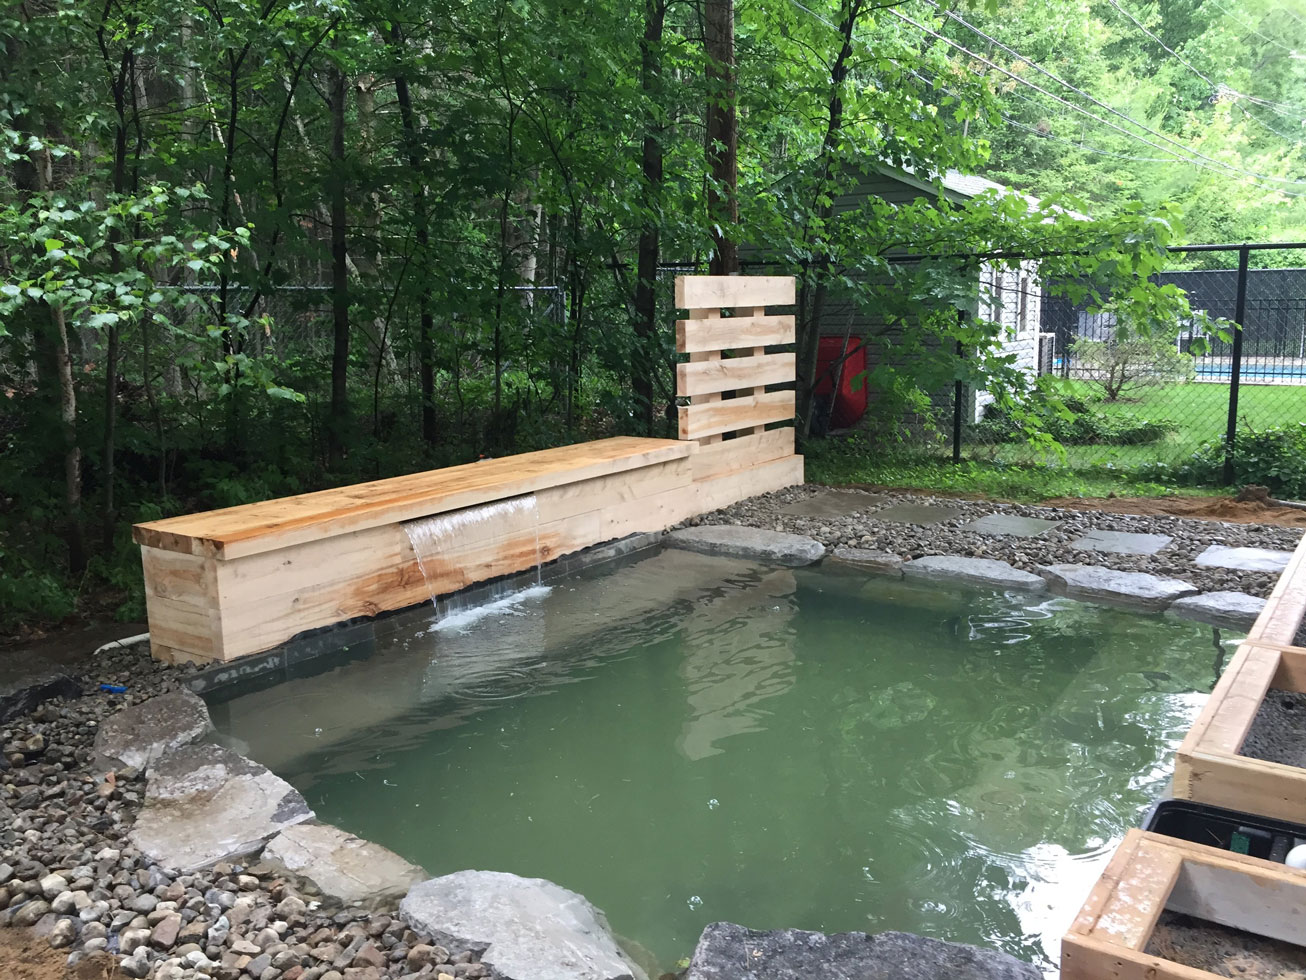 transformation d'une piscine en piscine naturelle